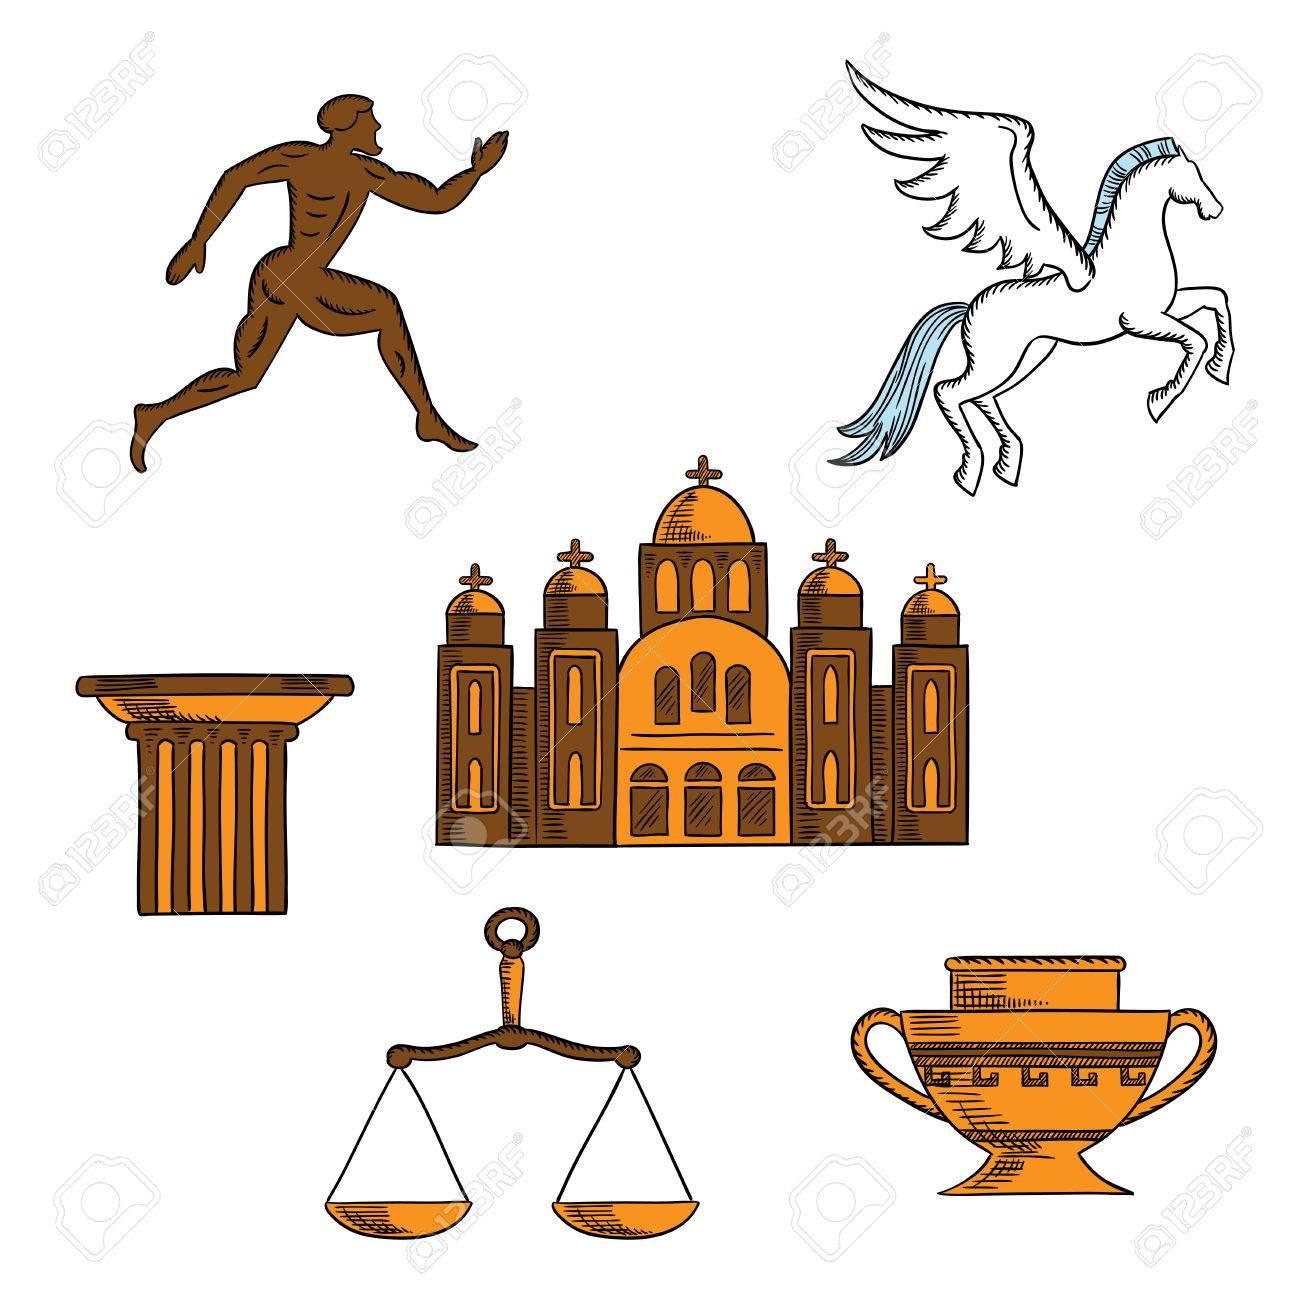 Ancient greek mythology art religion and architecture sketches ancient greek mythology art religion and architecture sketches for welcome to greece concept design biocorpaavc